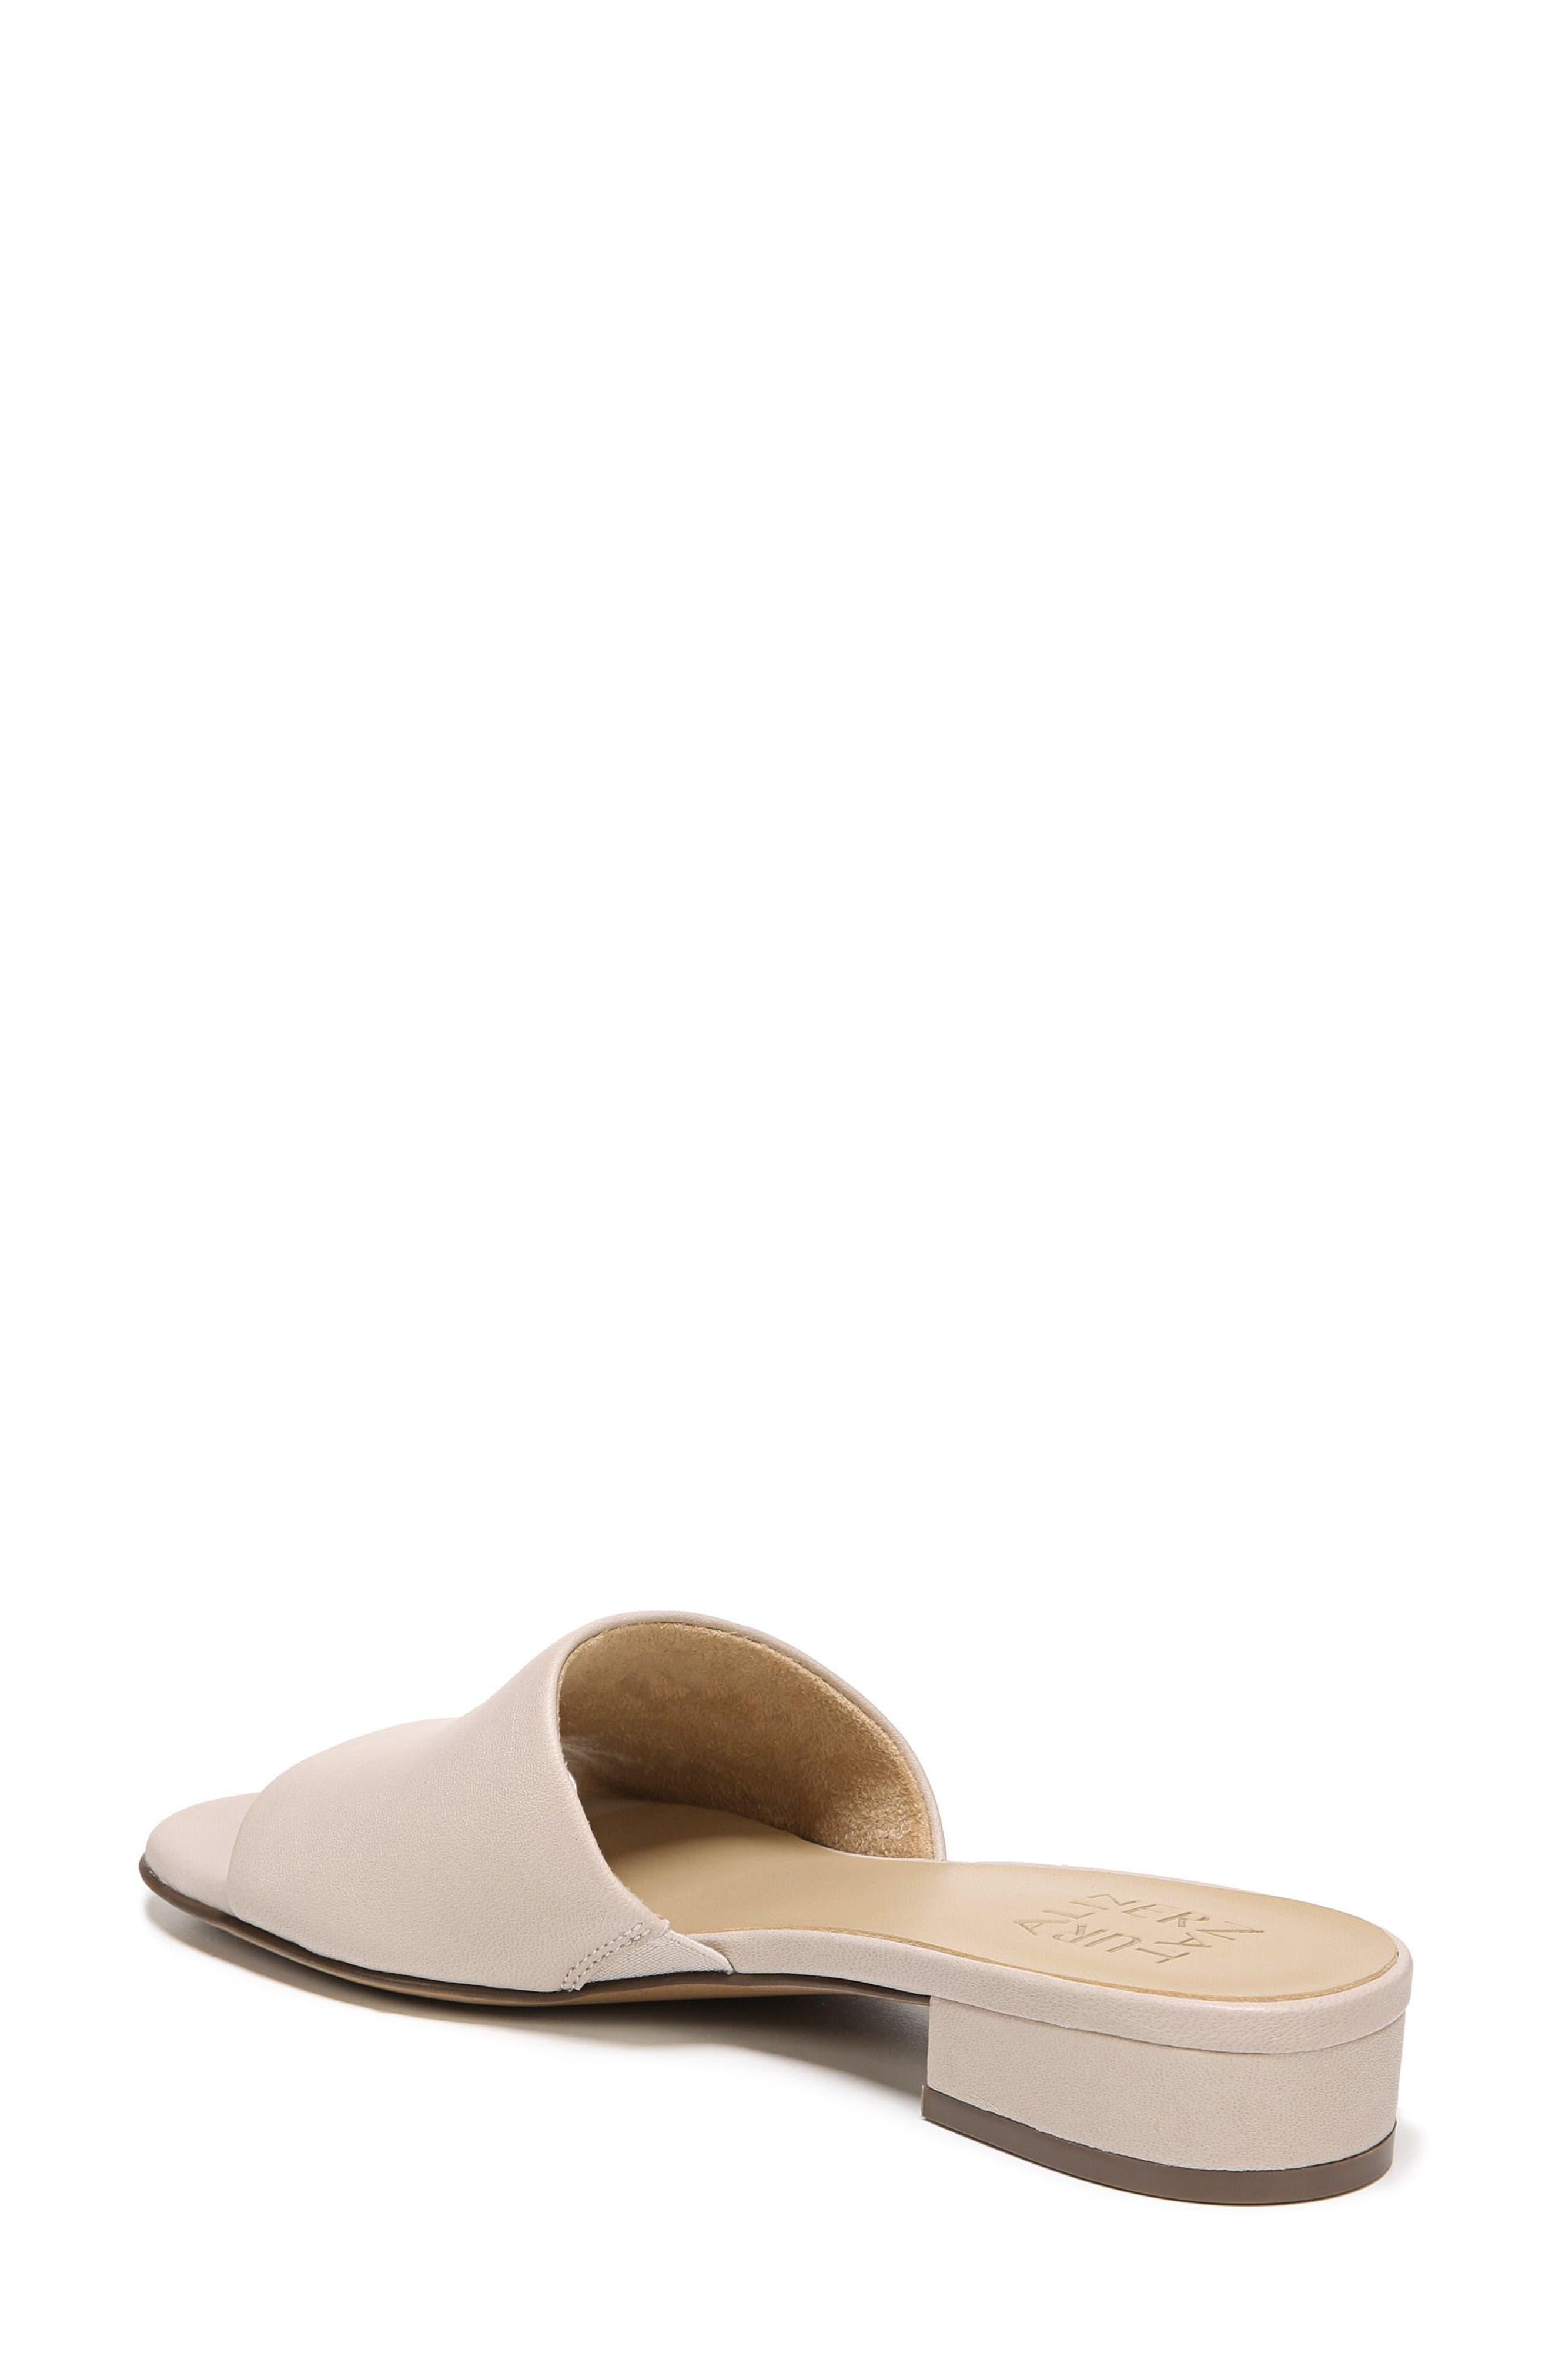 Mason Slide Sandal,                             Alternate thumbnail 2, color,                             Grey Leather